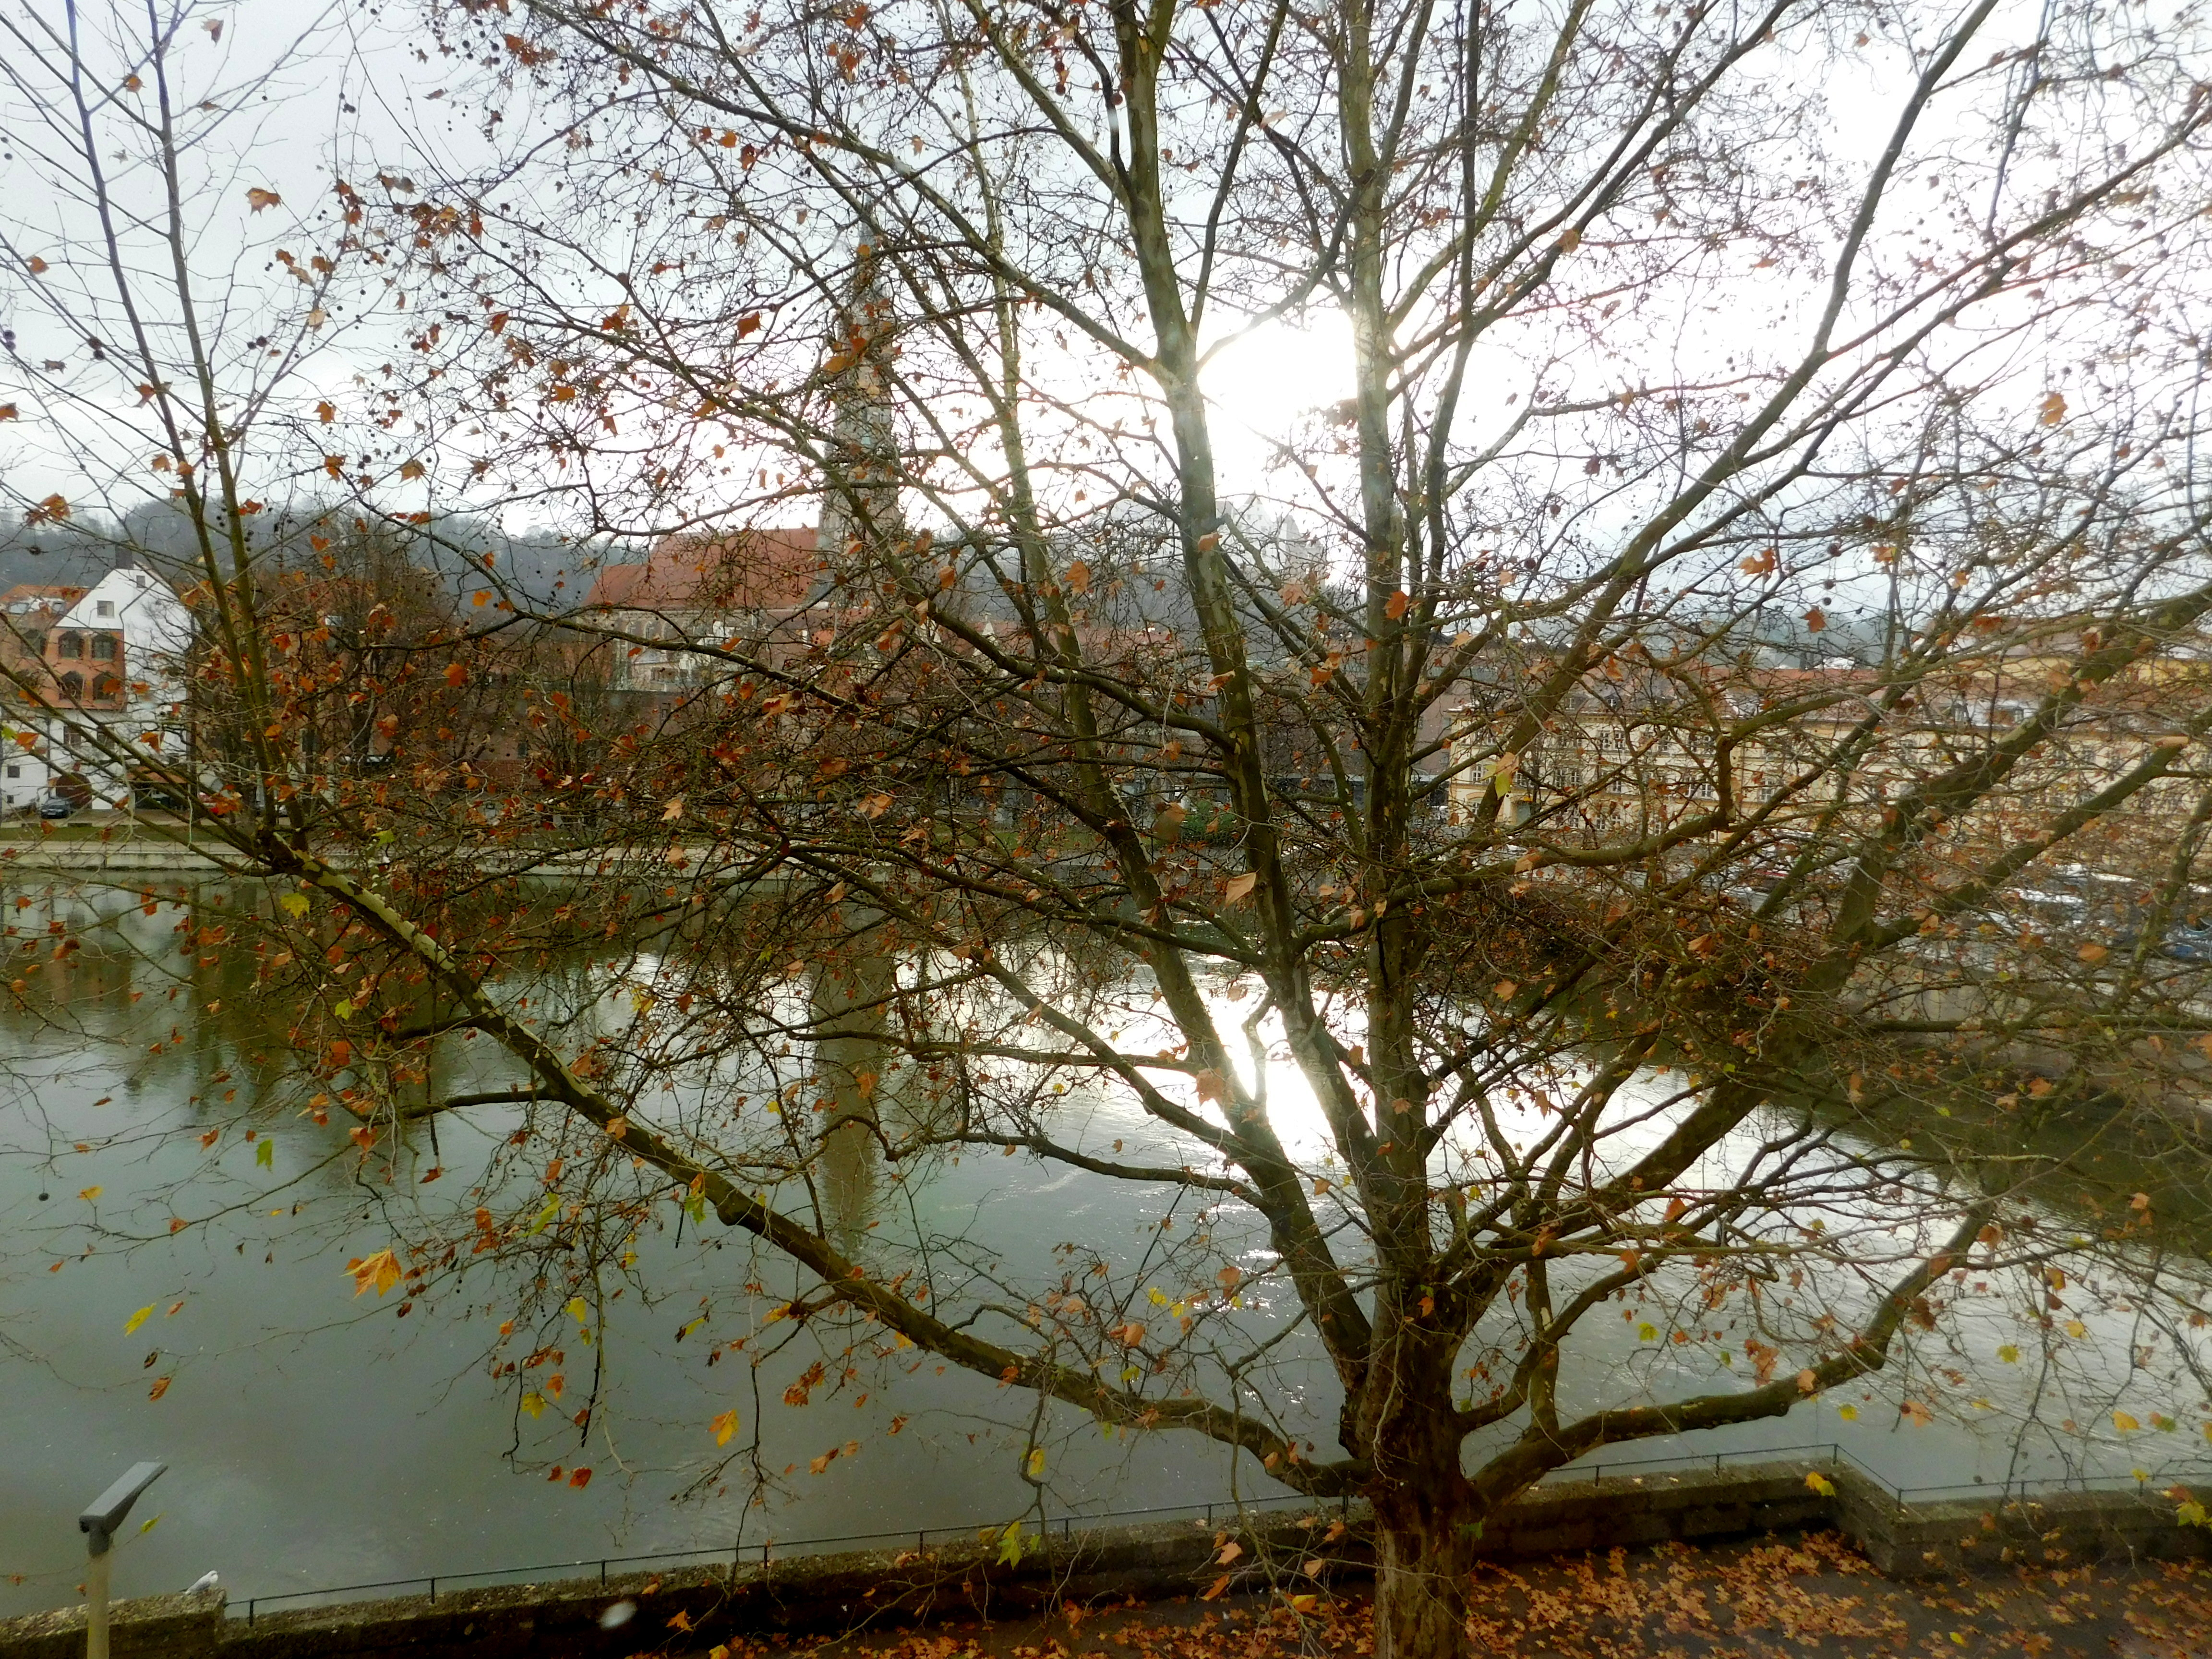 landshut tree